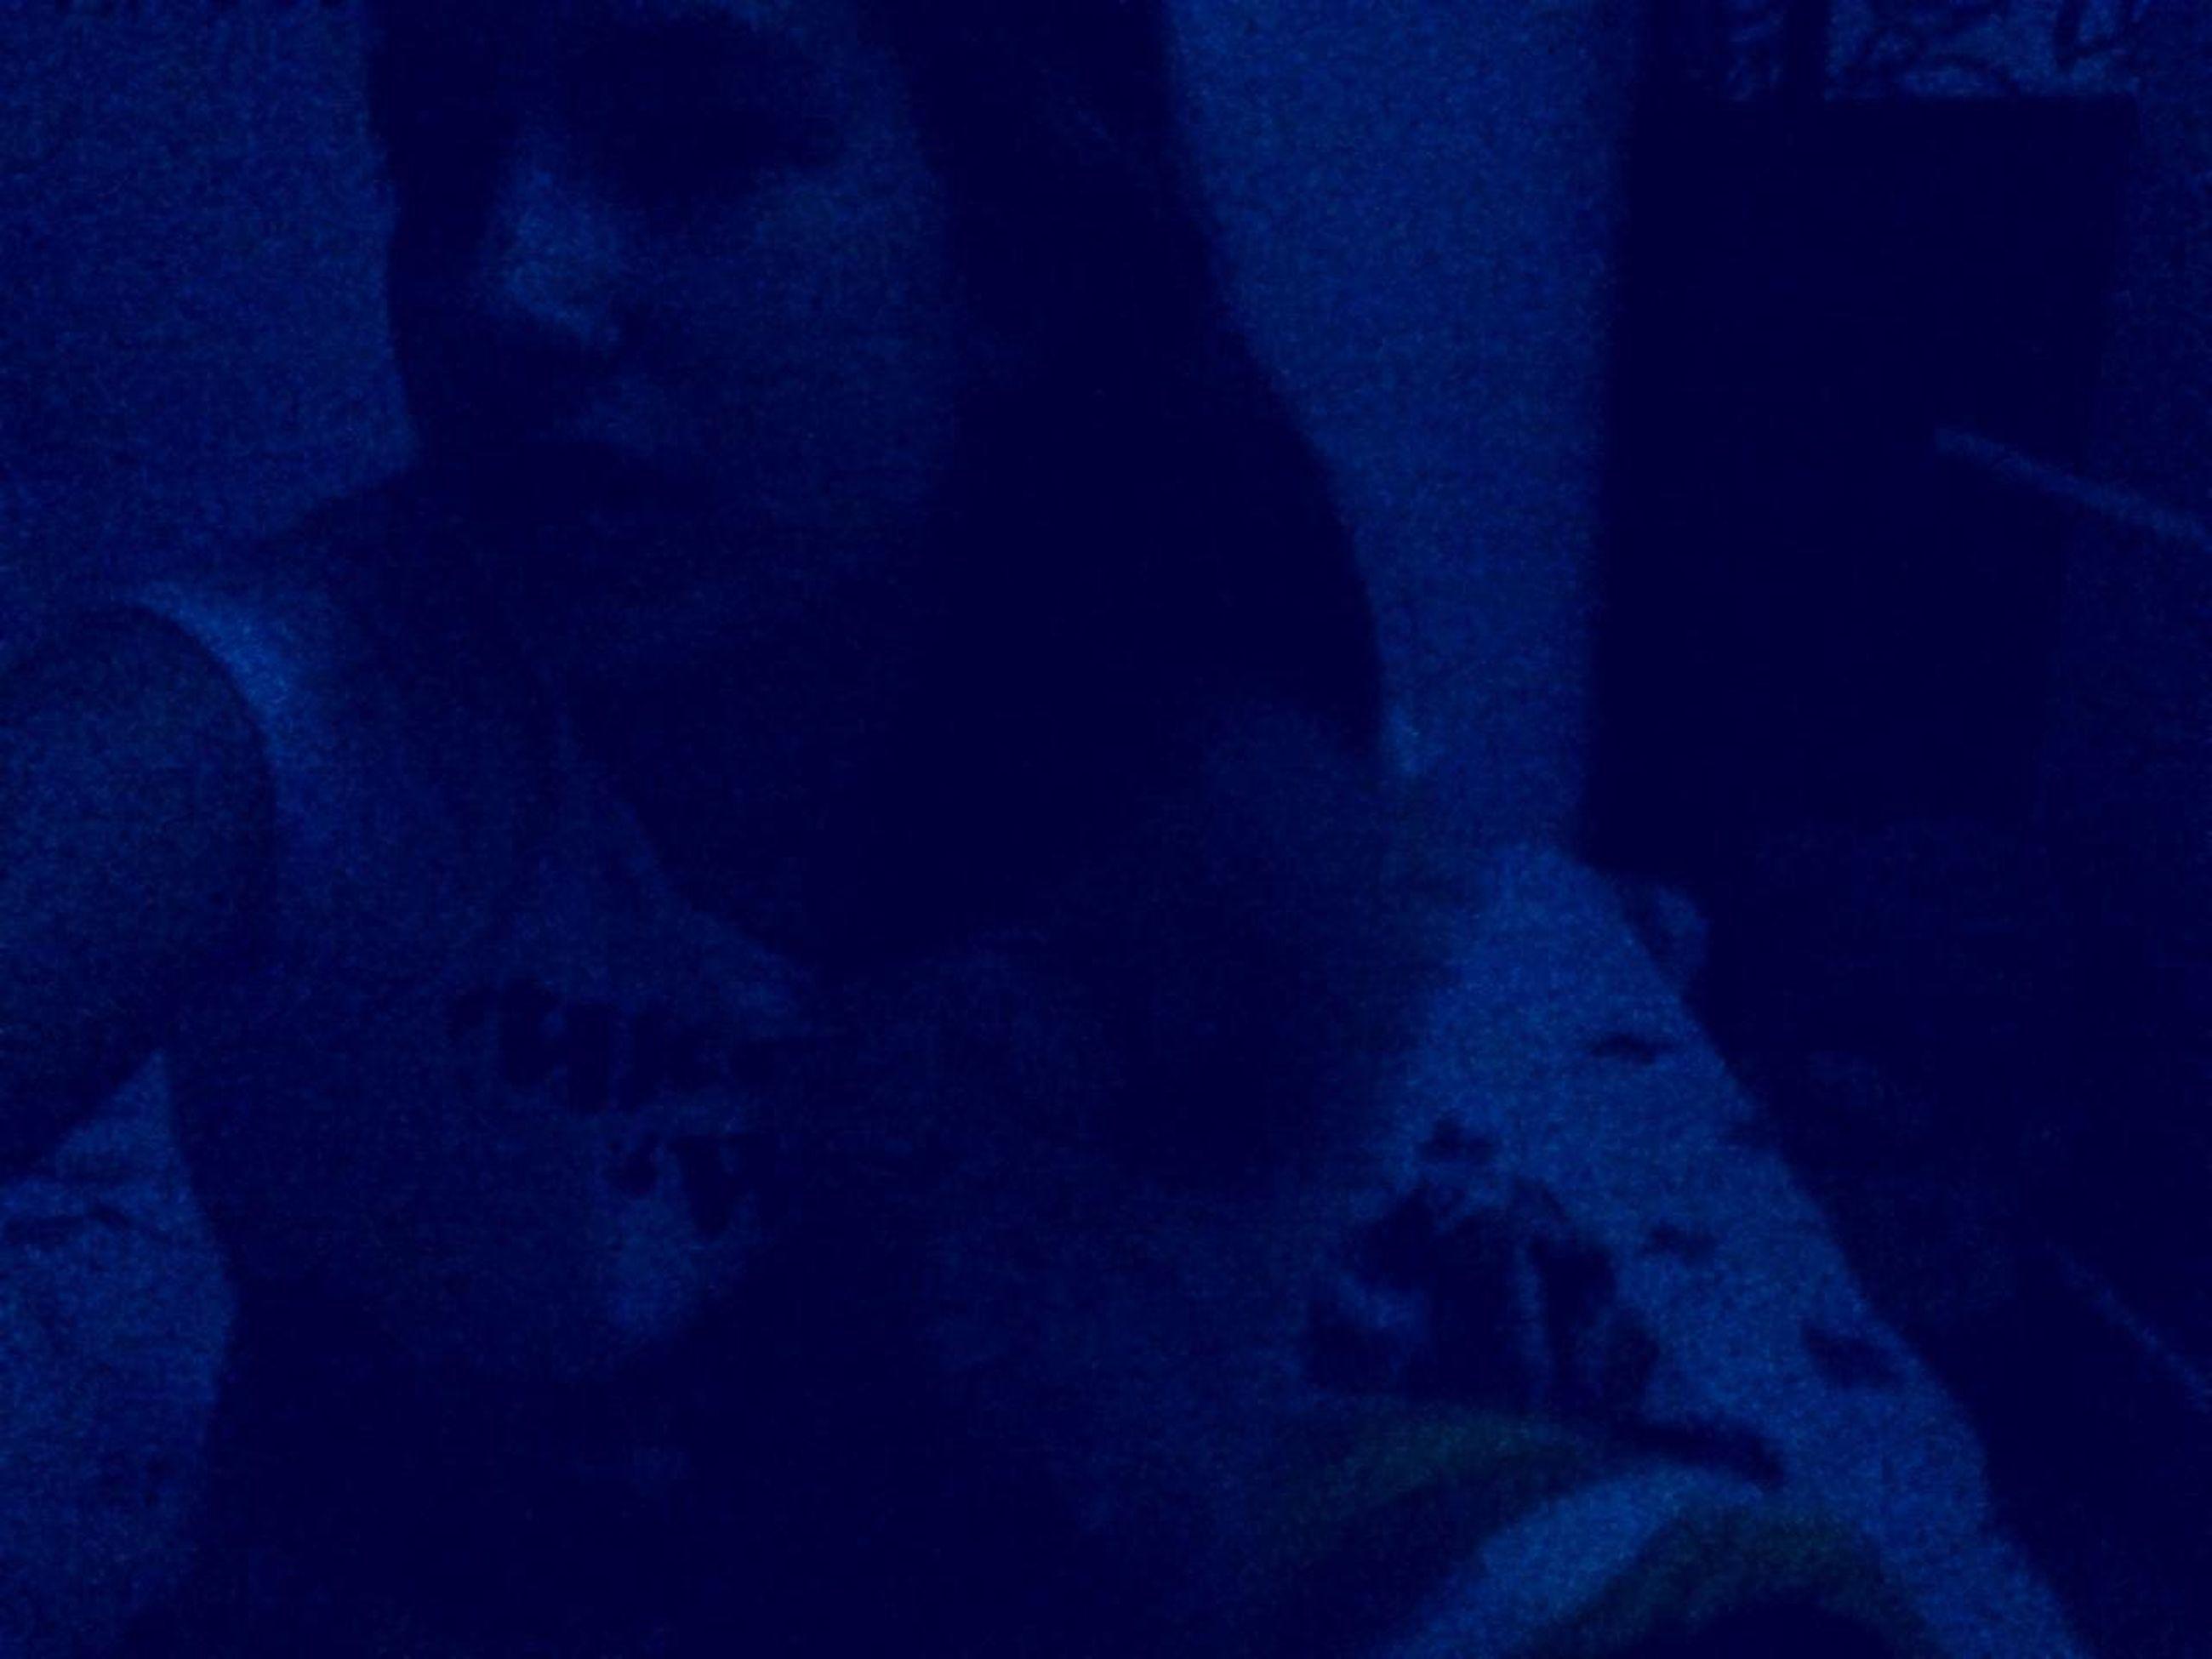 indoors, blue, lifestyles, men, close-up, leisure activity, underwater, night, unrecognizable person, headshot, dark, light - natural phenomenon, part of, illuminated, auto post production filter, person, silhouette